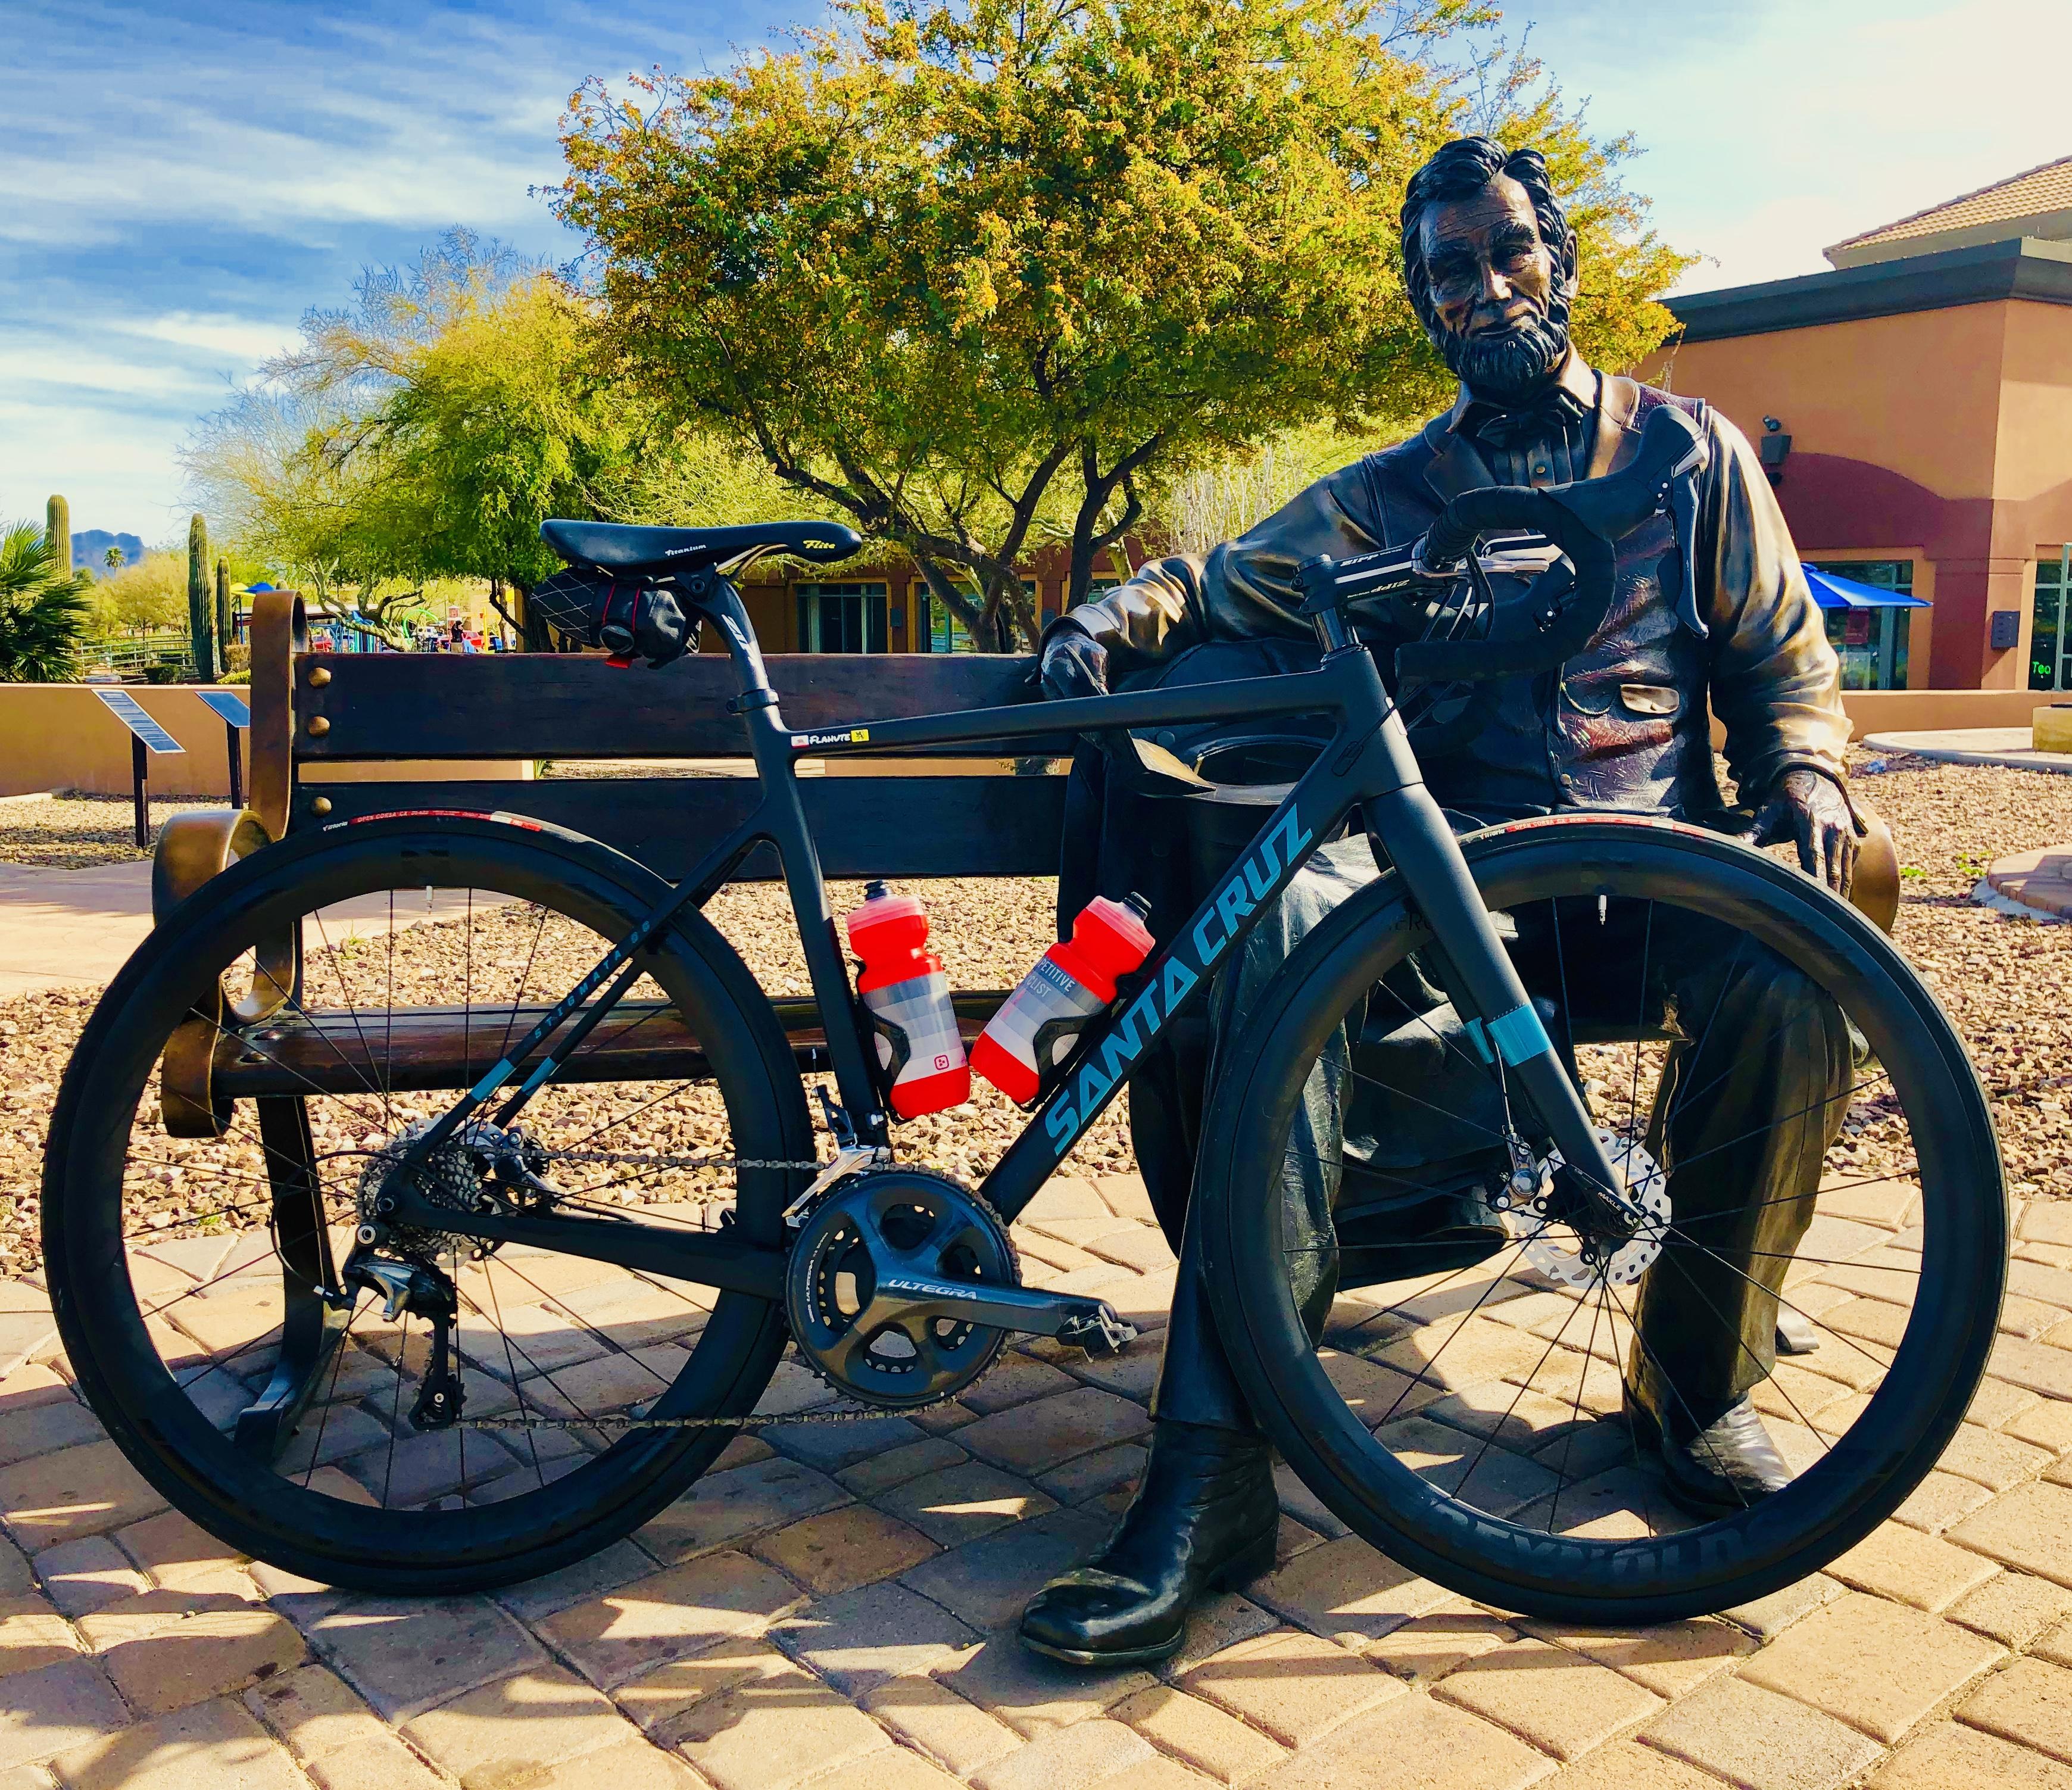 Honest Abe keeping an eye on my Santa Cruz Stigmata. Fountain Park, Fountain Hills, Arizona.